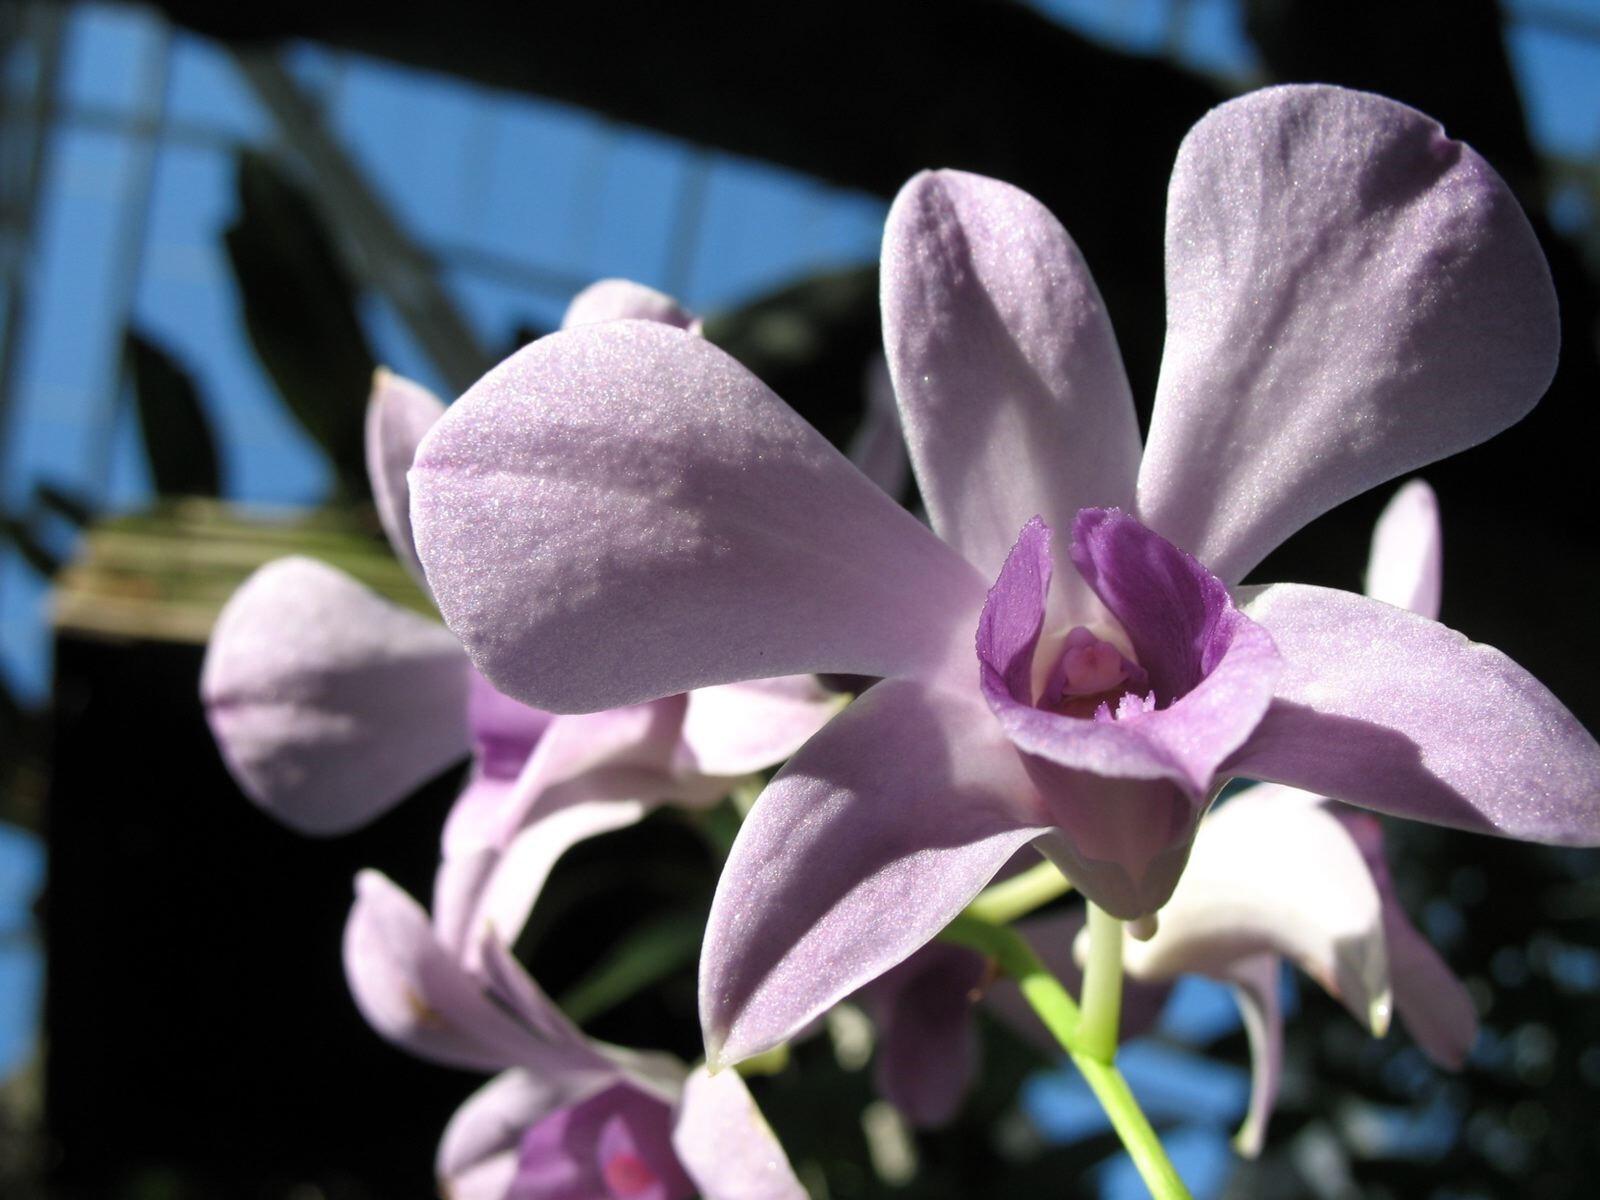 Hd Purple Flowers Photo Free Download Hd Wallpapers